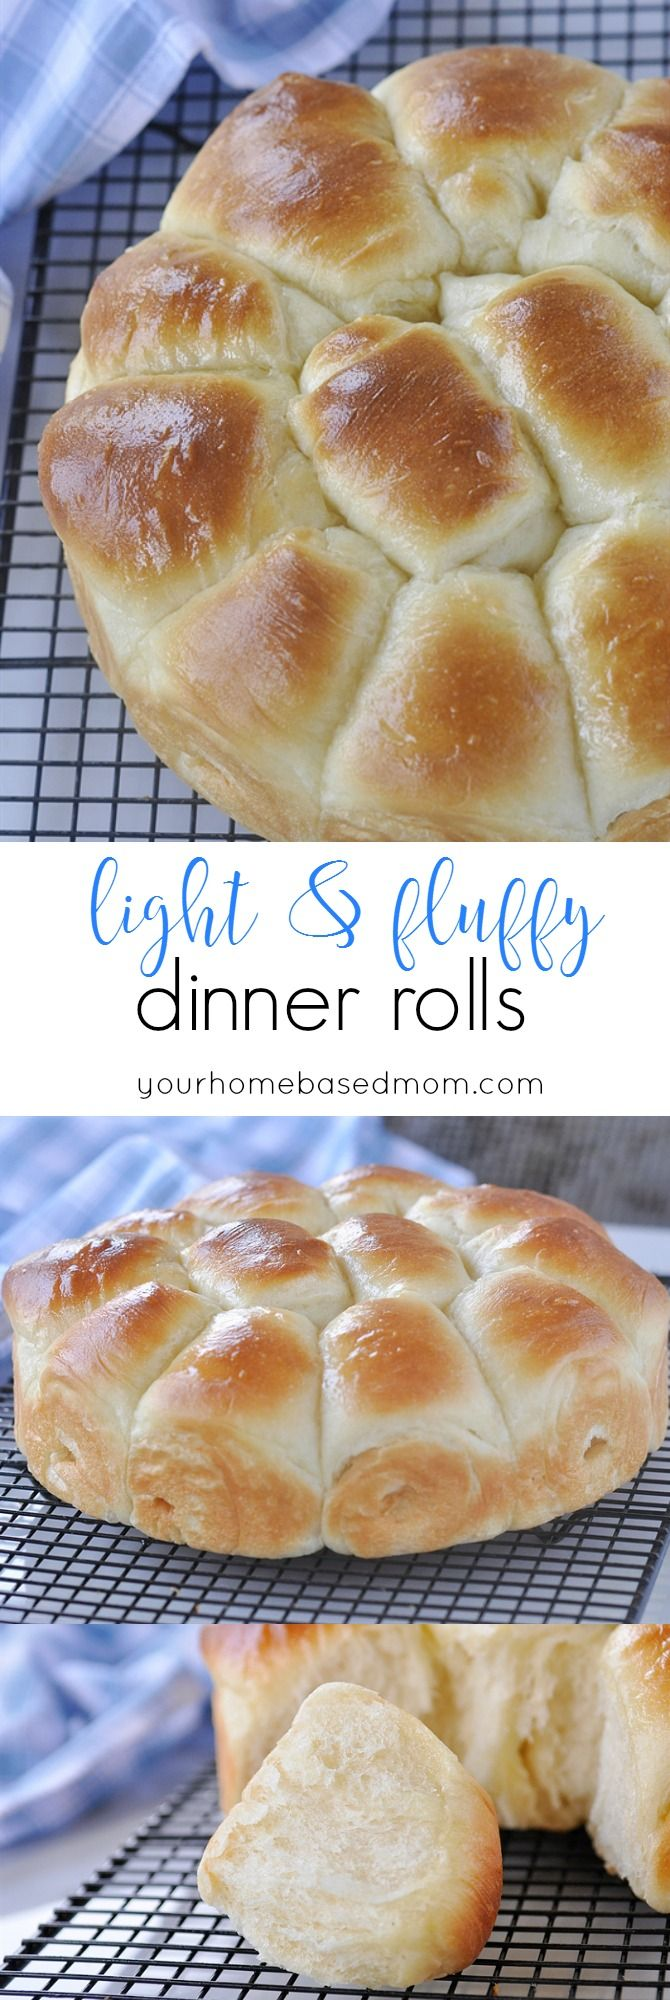 Light & Fluffy Dinner Rolls - amazingly light and delicious @yourhomebasedmom.com